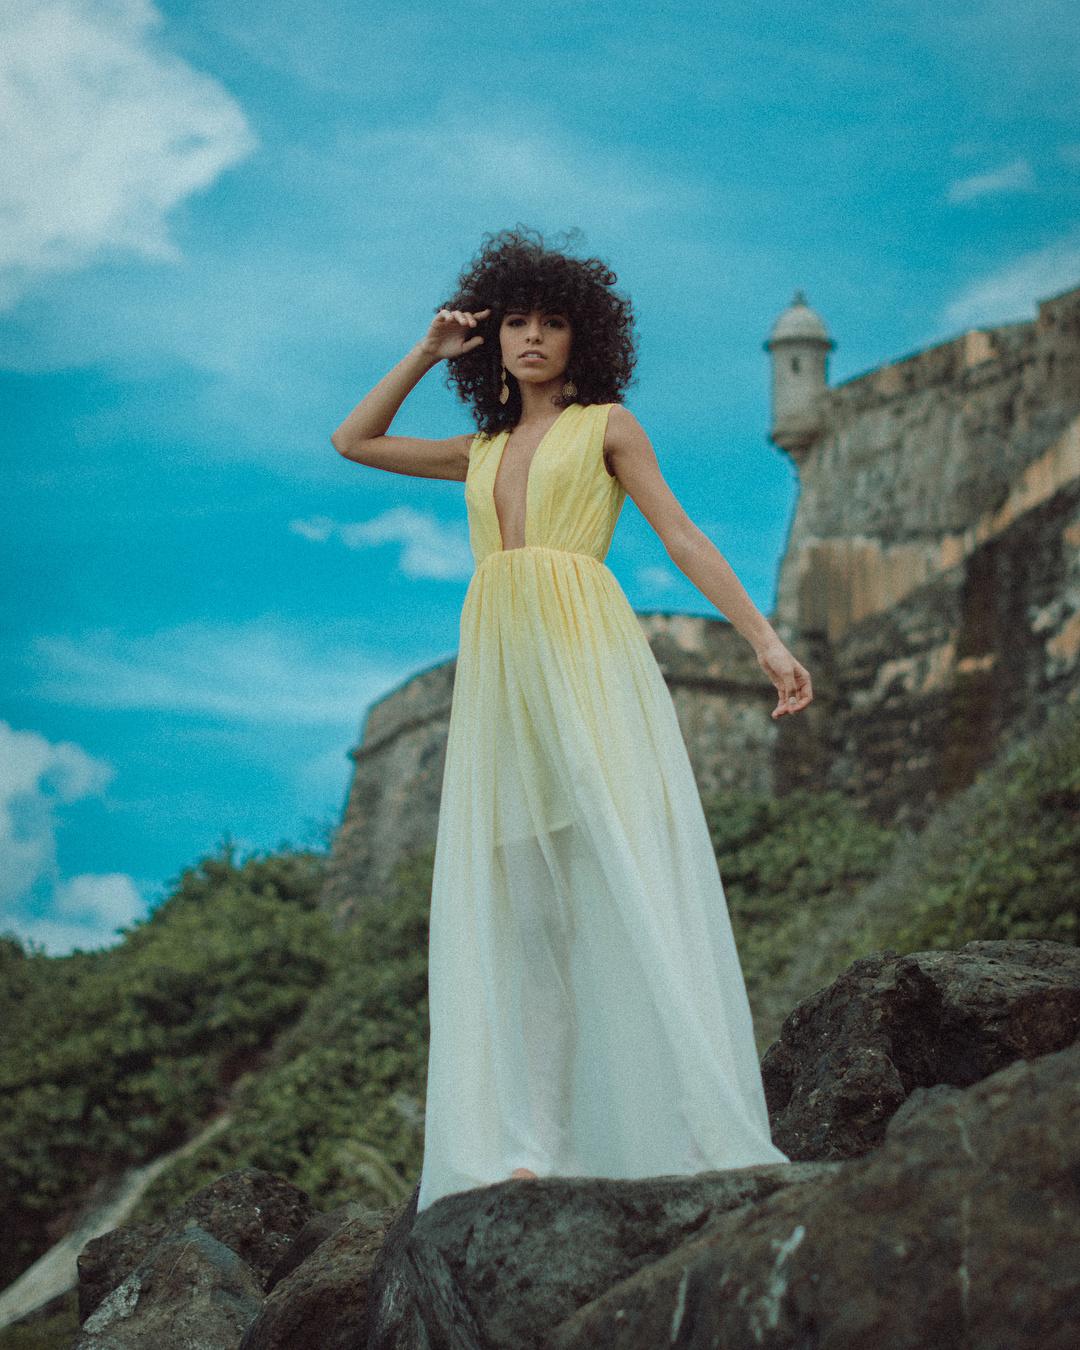 yuanilie alvarado, segunda finalista de reyna hispanoamericana 2019. 33861111